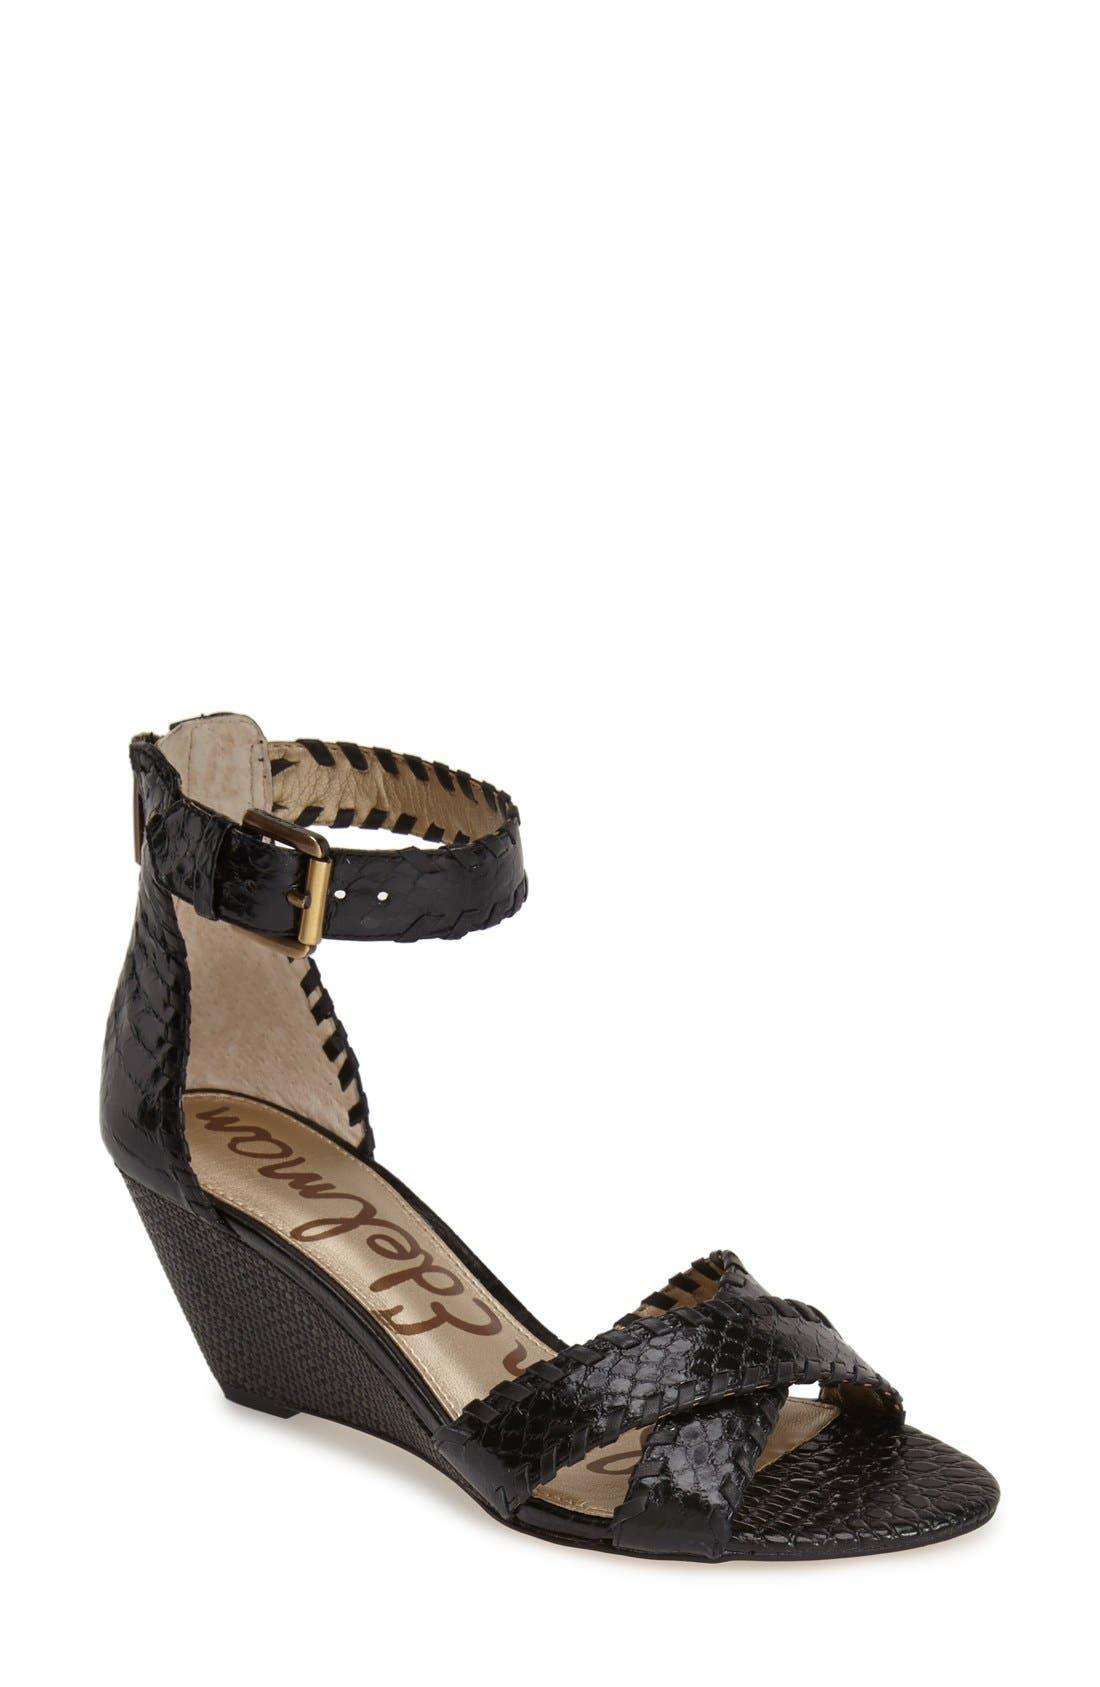 Main Image - Sam Edelman 'Silvia' Ankle Strap Wedge Sandal (Women)